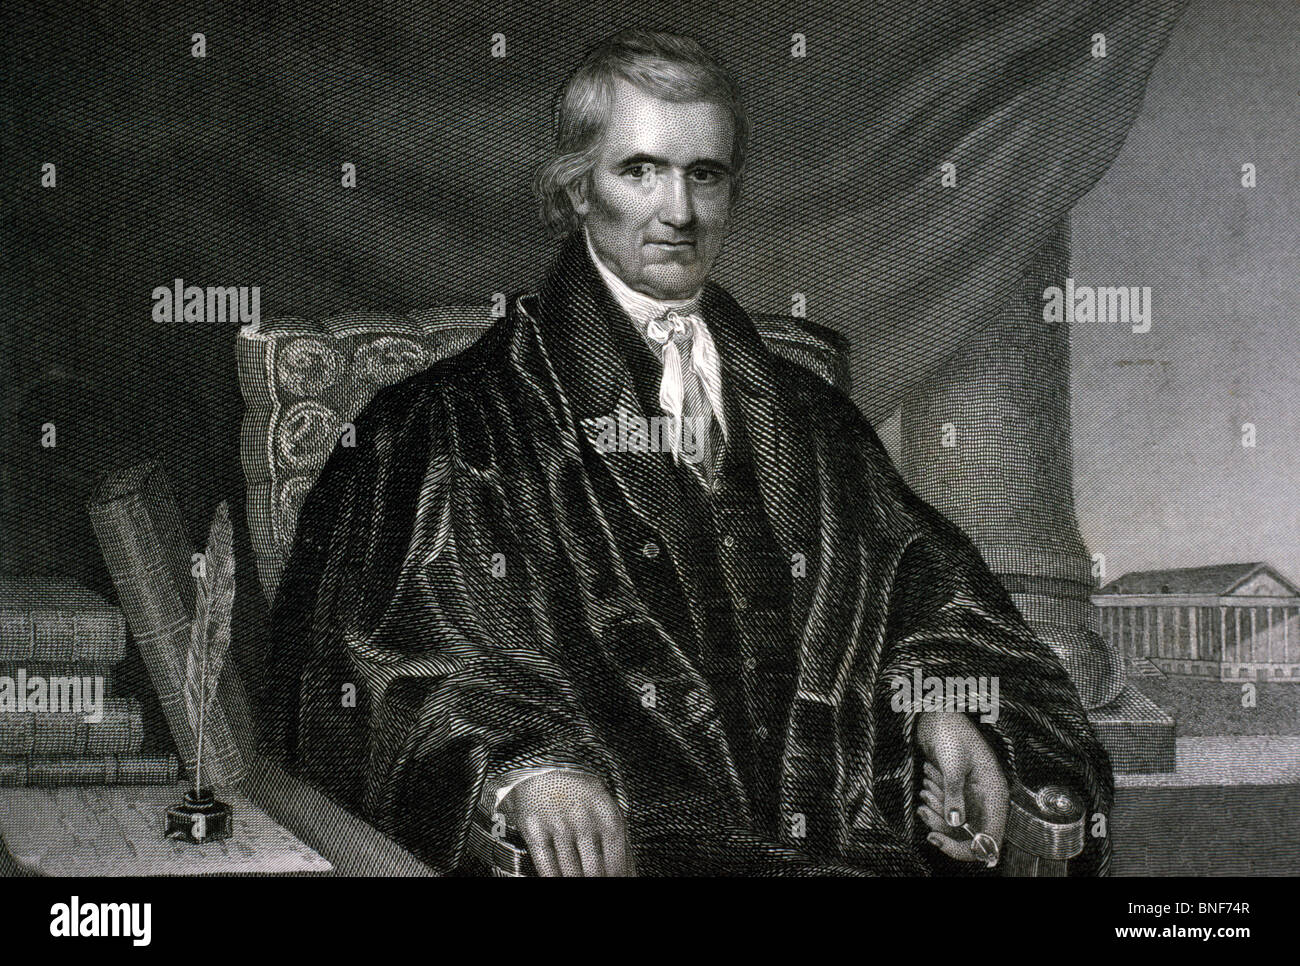 Chief Justice John Marshall, US Supreme Court, American History - Stock Image